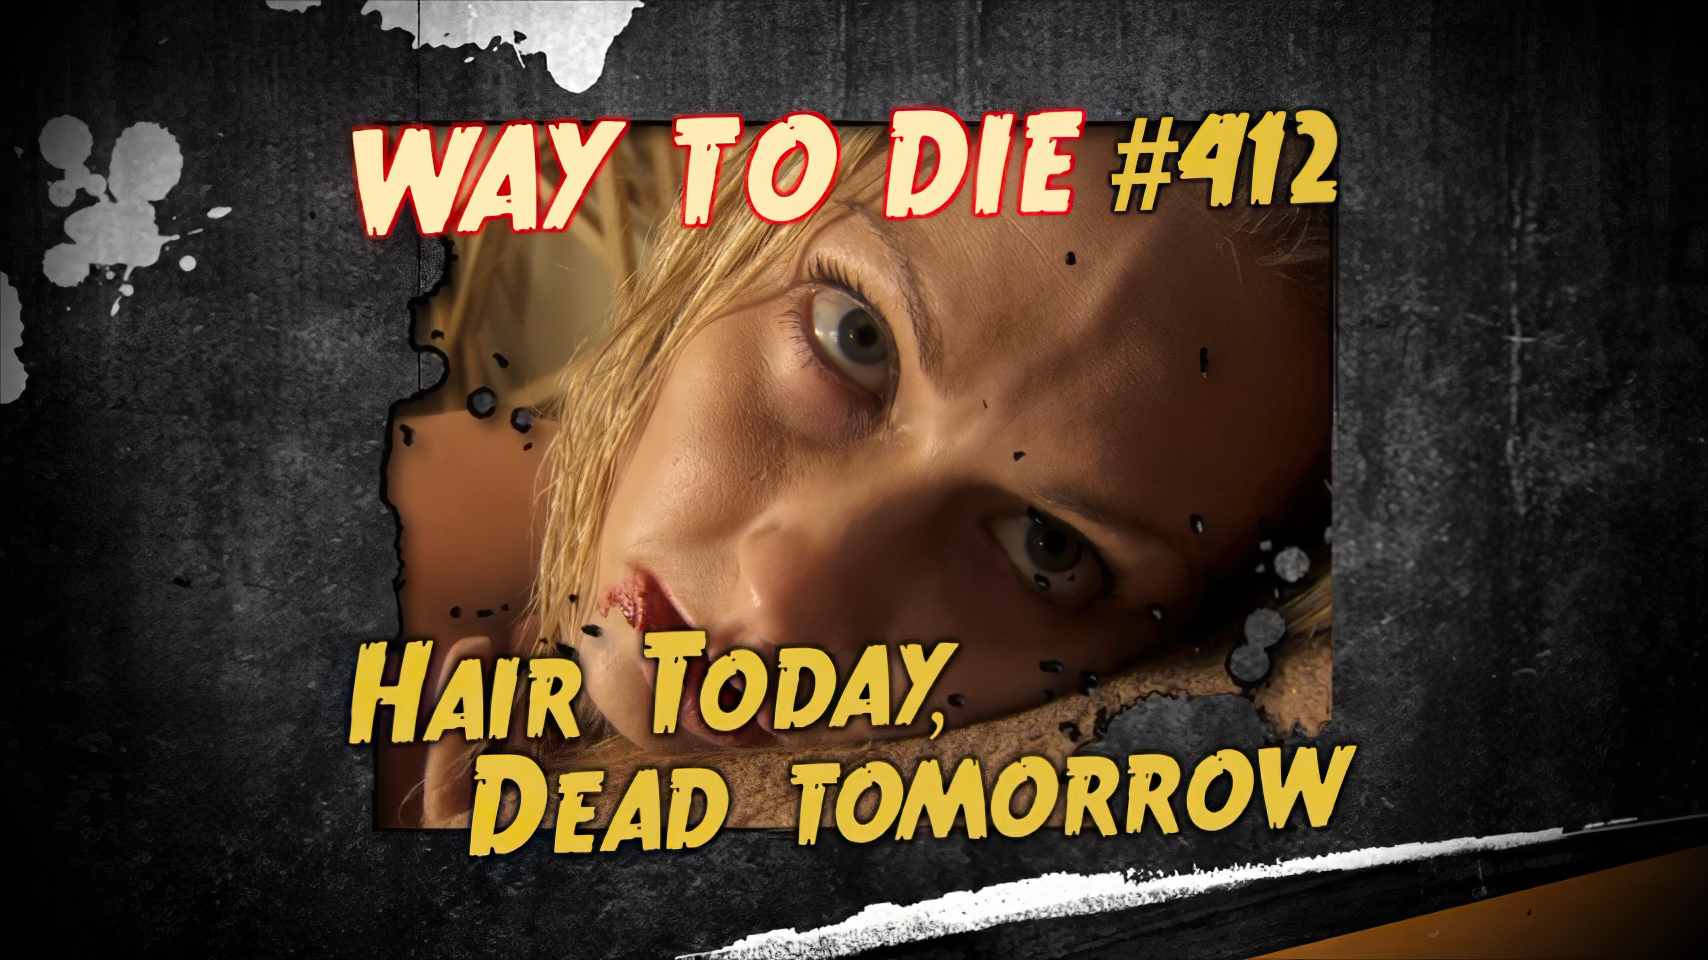 hair today dead tomorrow 1000 ways to die wiki fandom powered